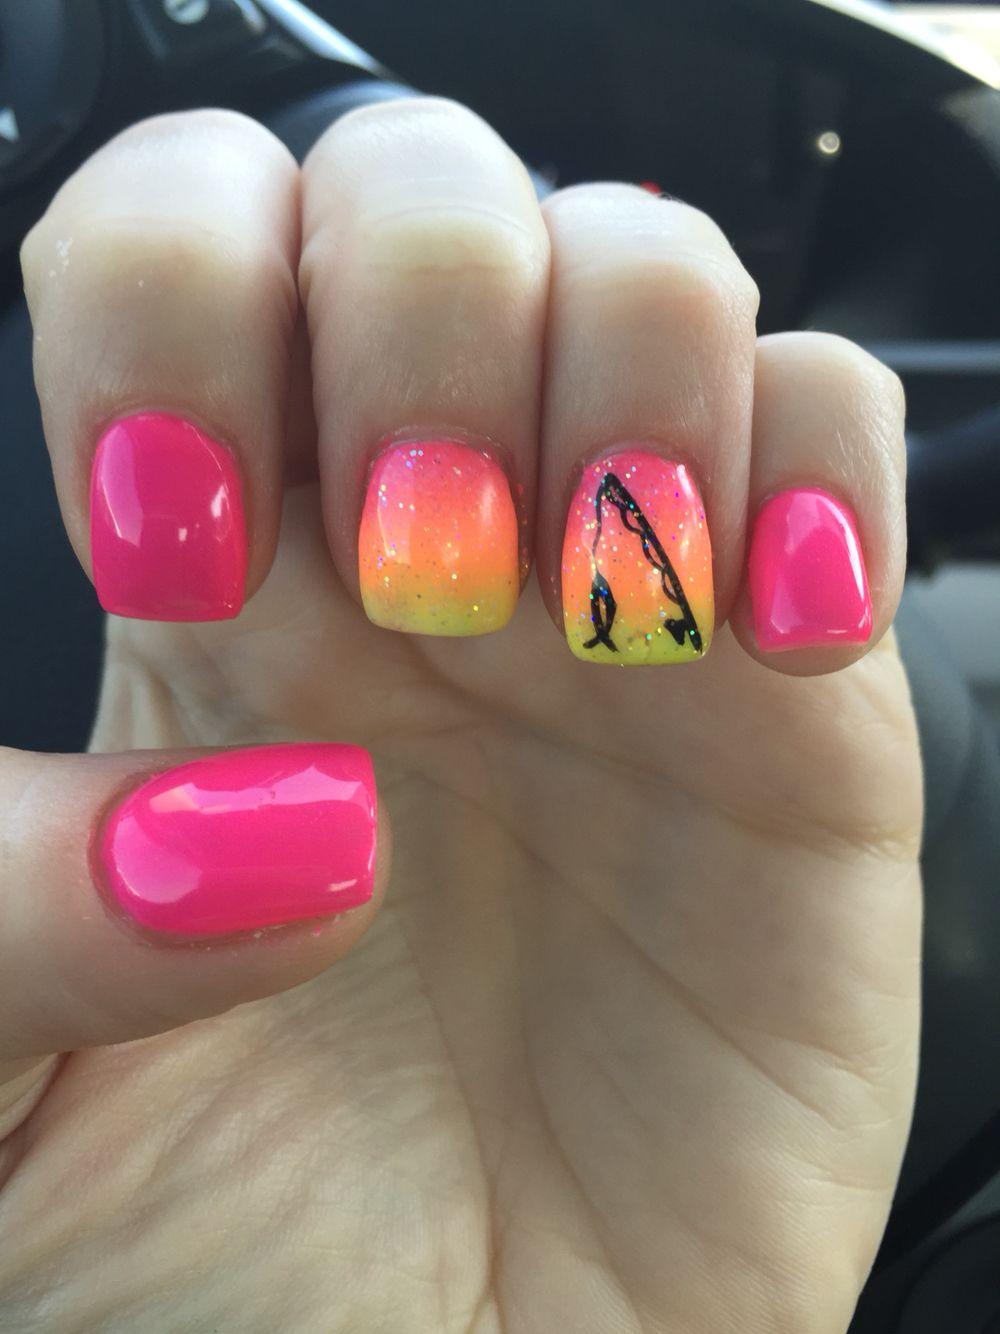 Girly fishing nail art! Pink, glitter, ombré :-) - Girly Fishing Nail Art! Pink, Glitter, Ombré :-) Fishing